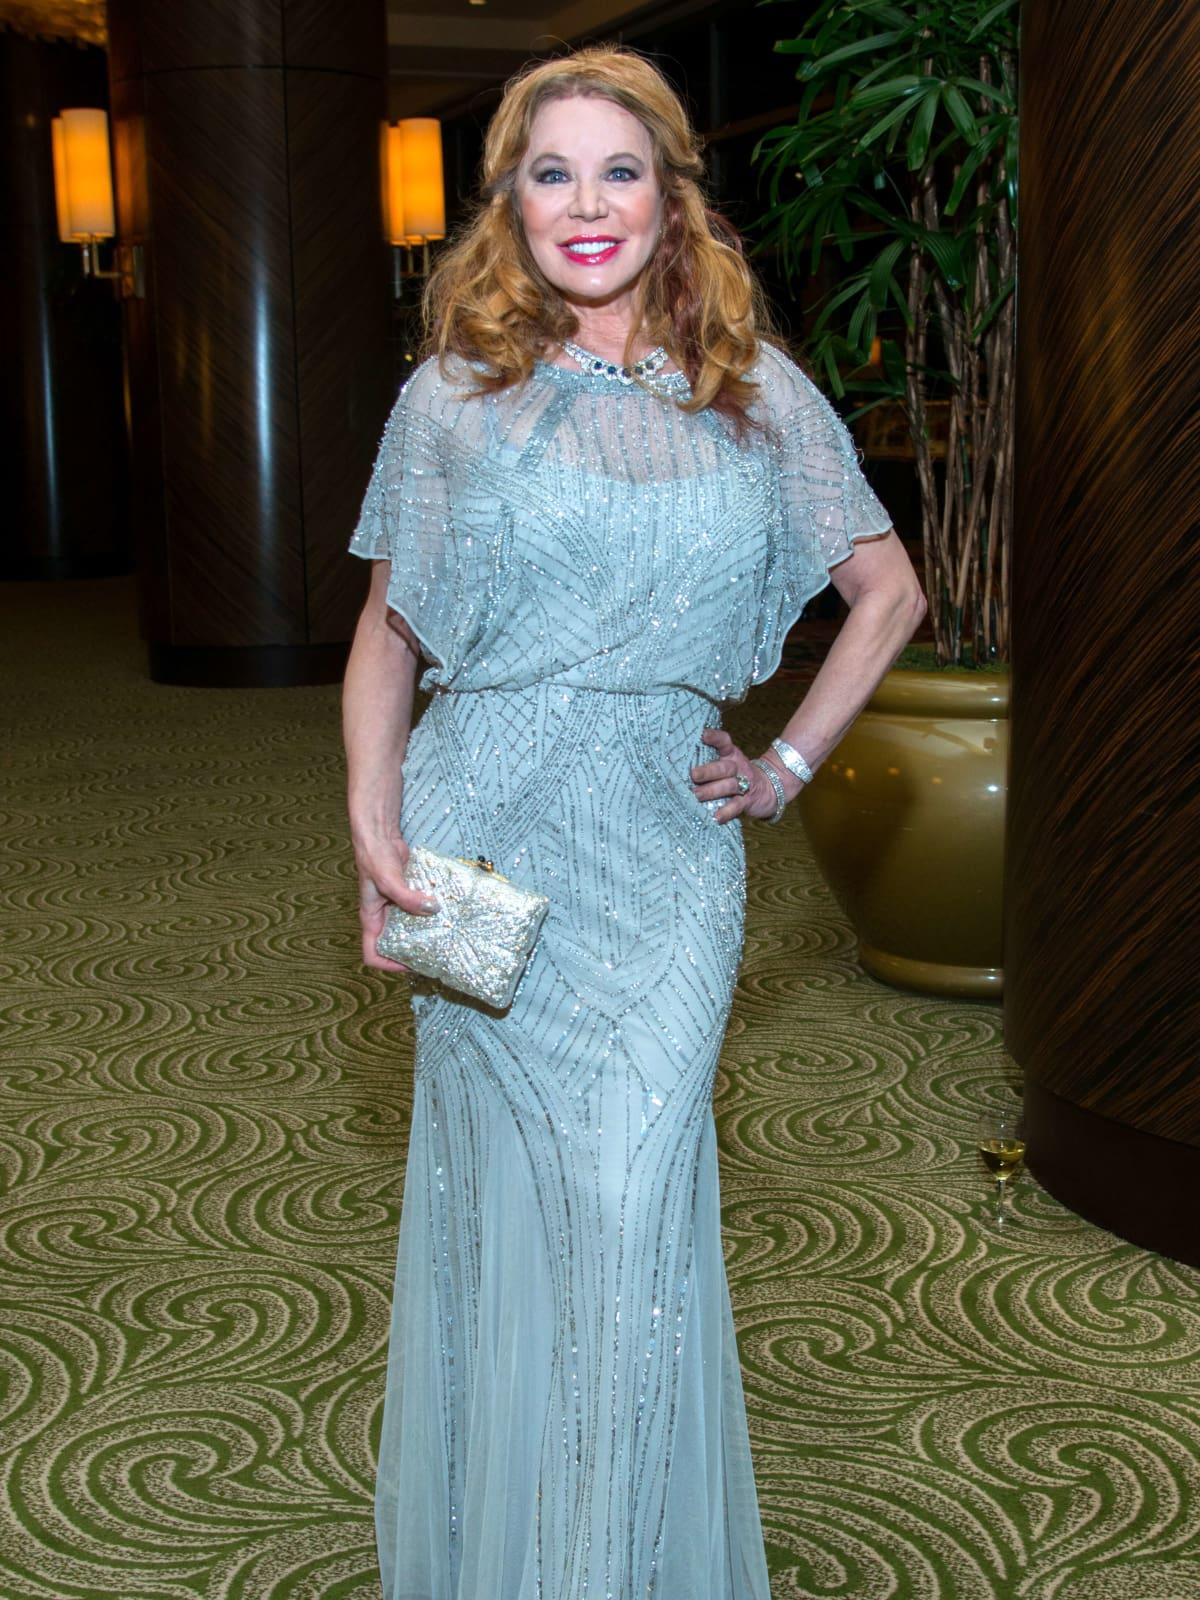 Houston, Women of Distinction fashionable gowns, Feb 2017, Cindi Rose